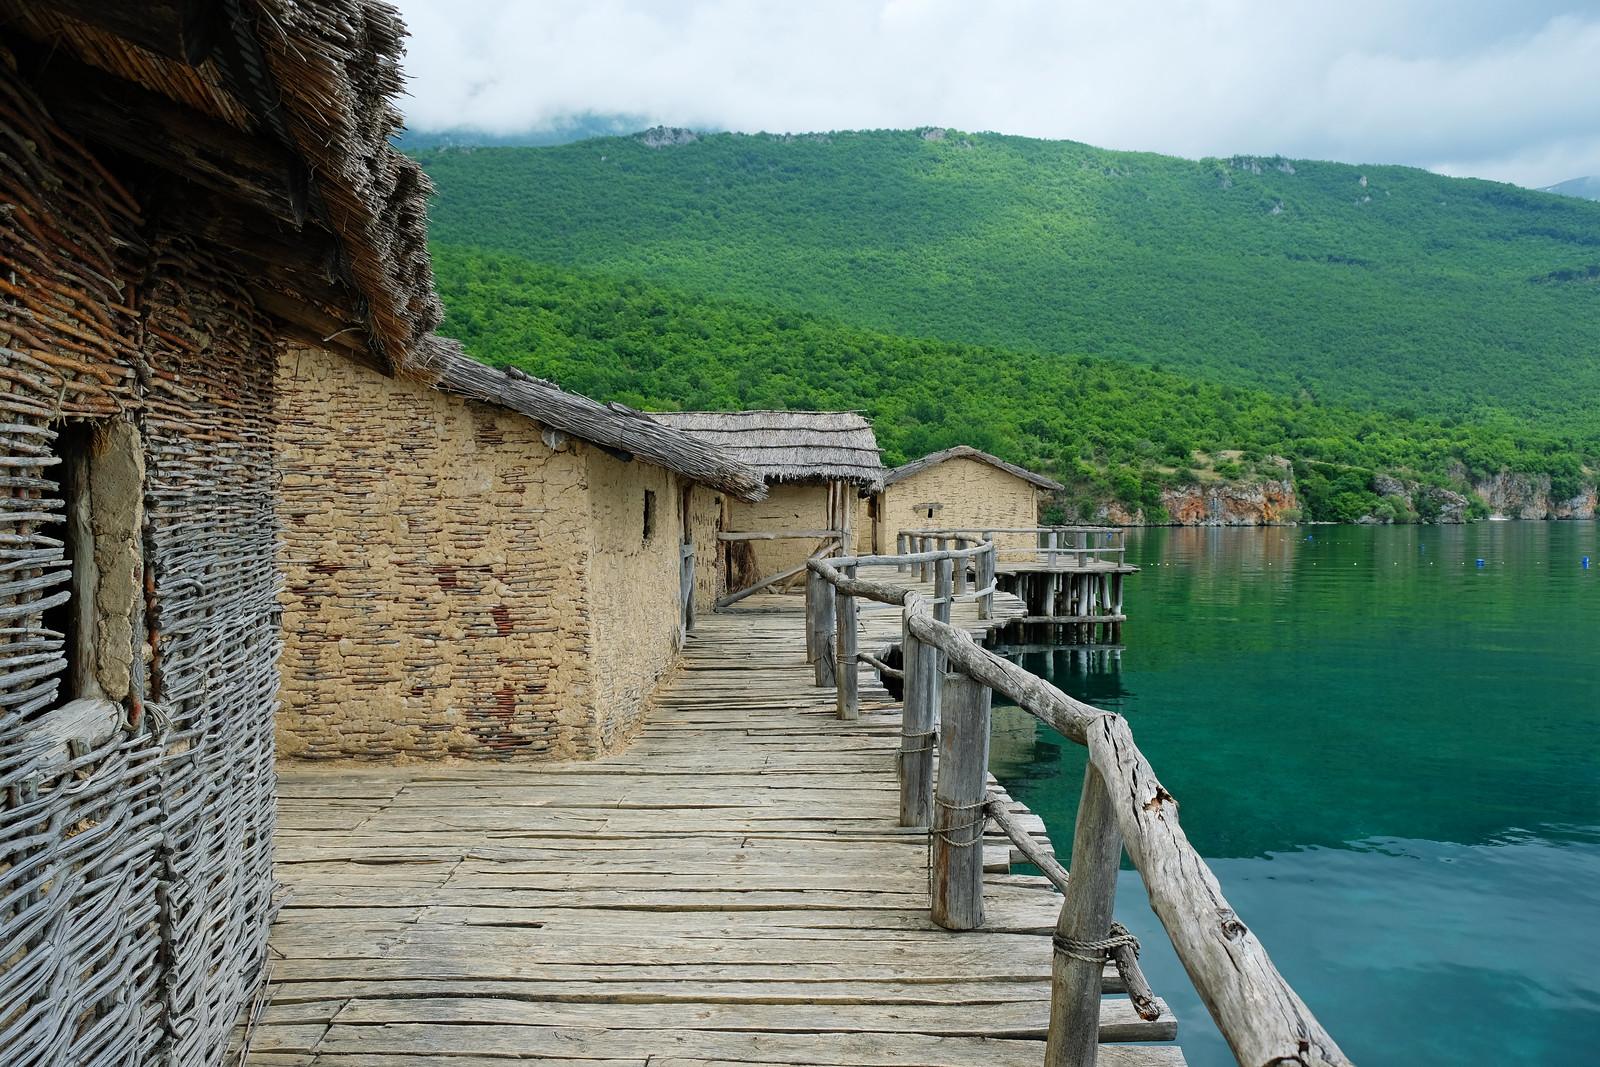 Bay of Bones, Lake Ohrid, North Macedonia